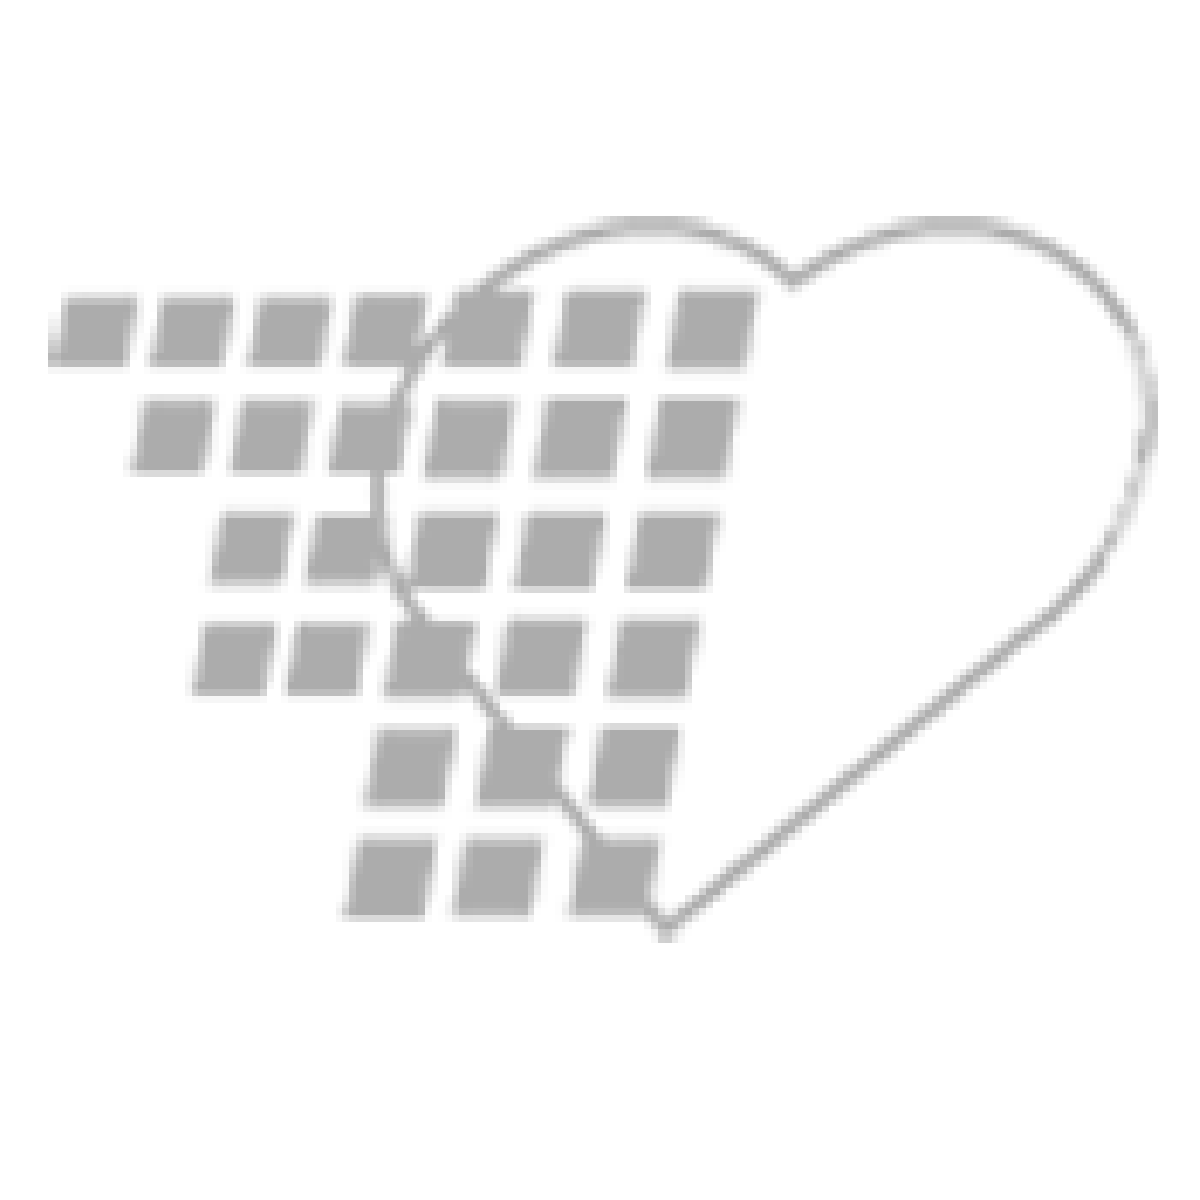 02-43-7732 Kendall™ 5500 Diagnostic Tab Electrodes